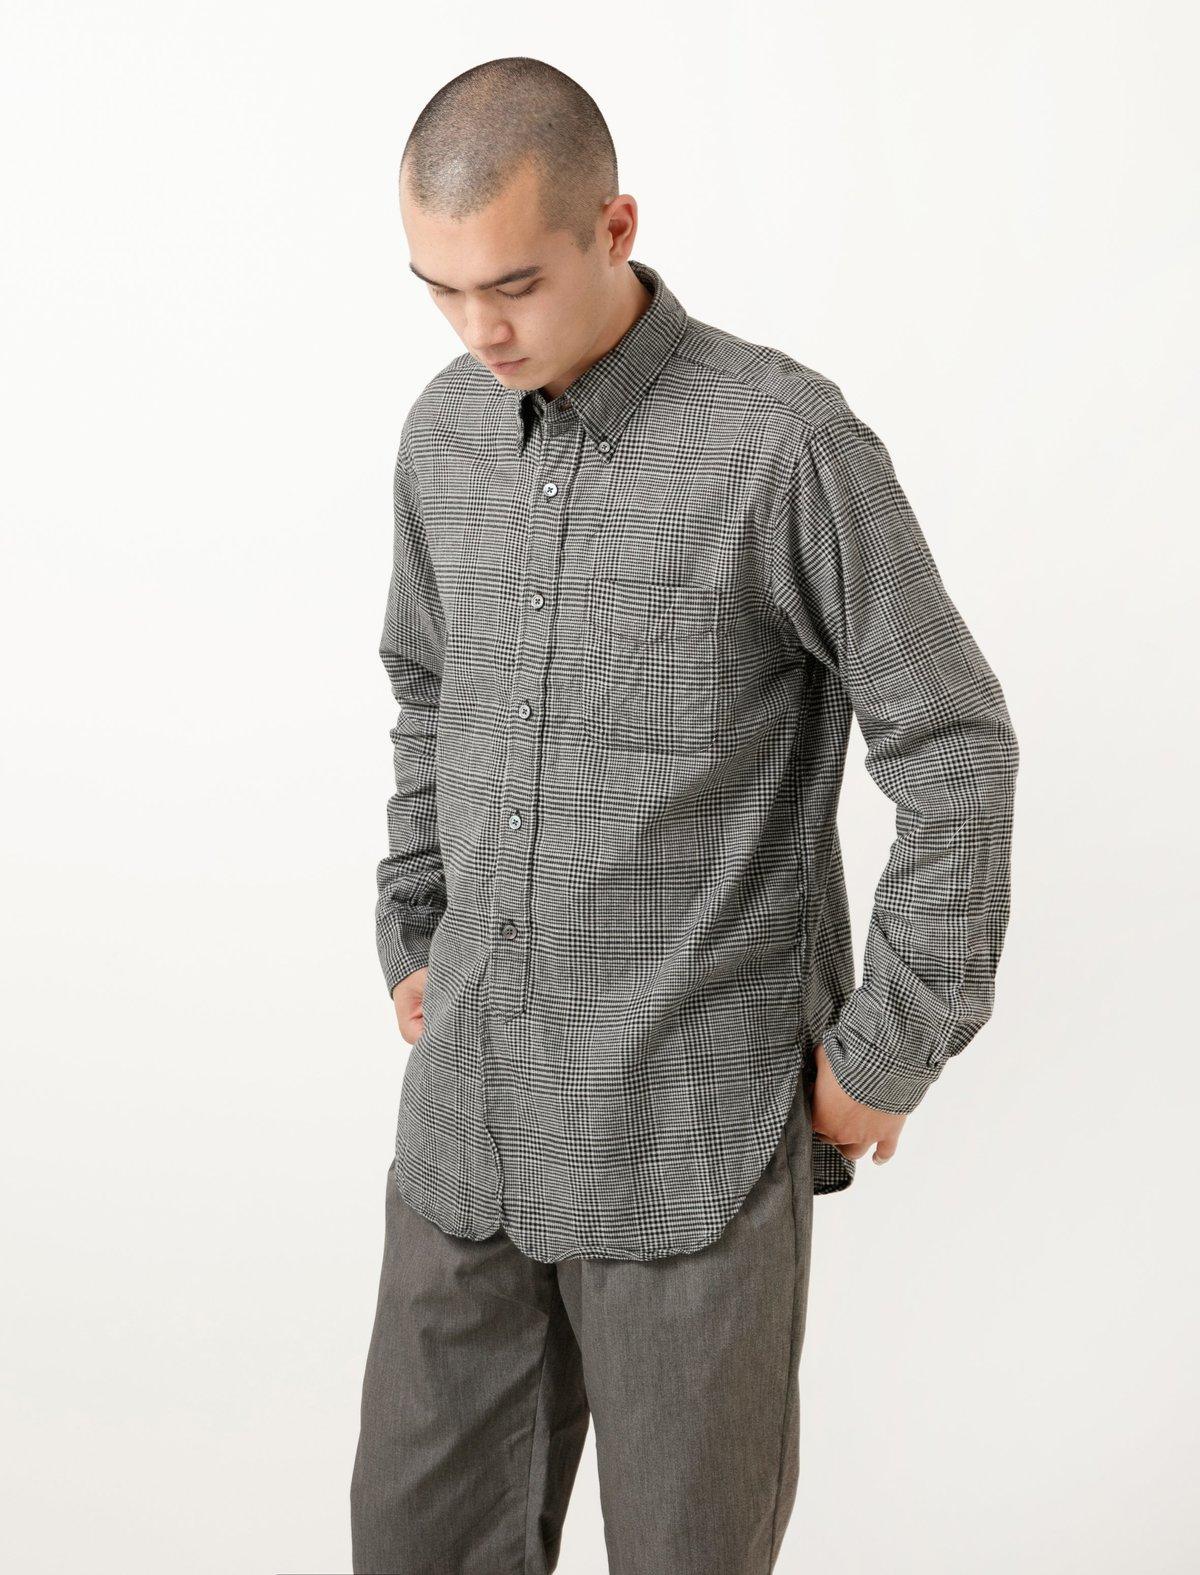 Engineered Garments 19th Century Bd Shirt Glen Plaid Garmentory Jacket Shop Neighbour